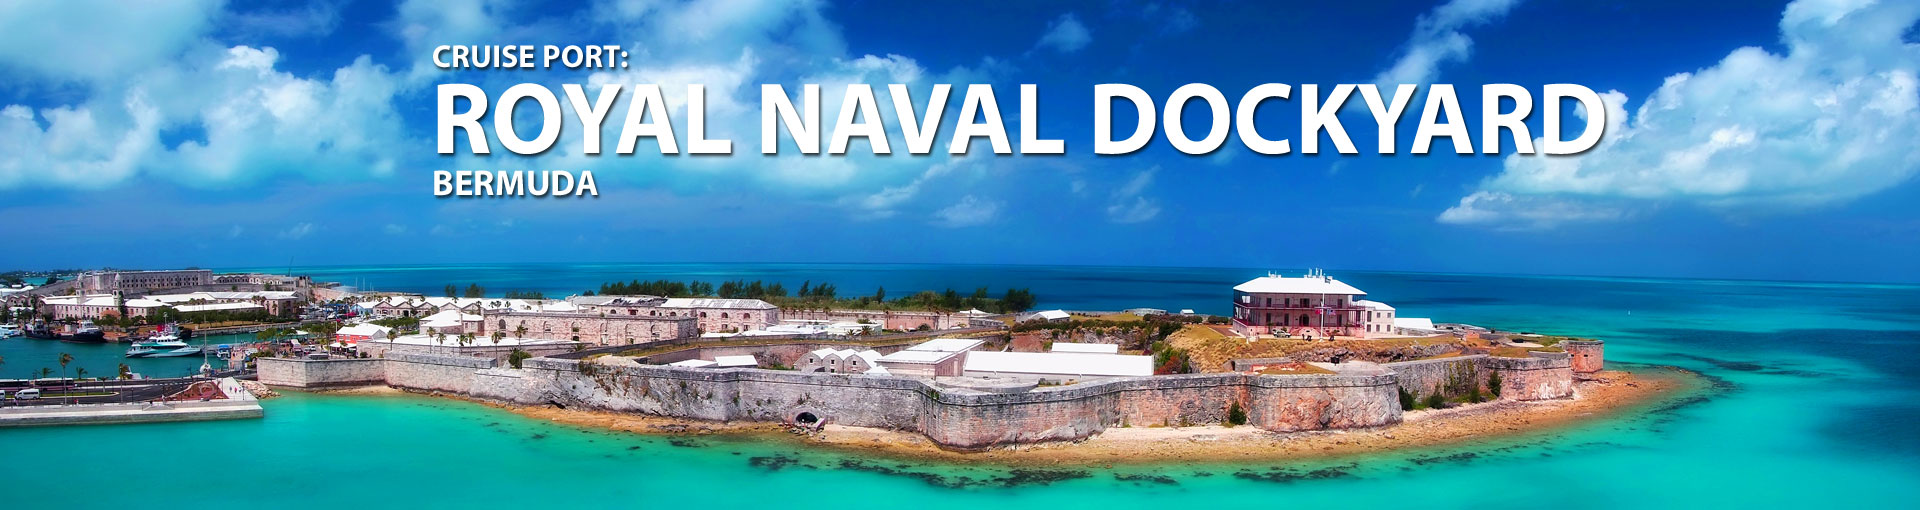 Cruises to Royal Naval Dockyard, Bermuda